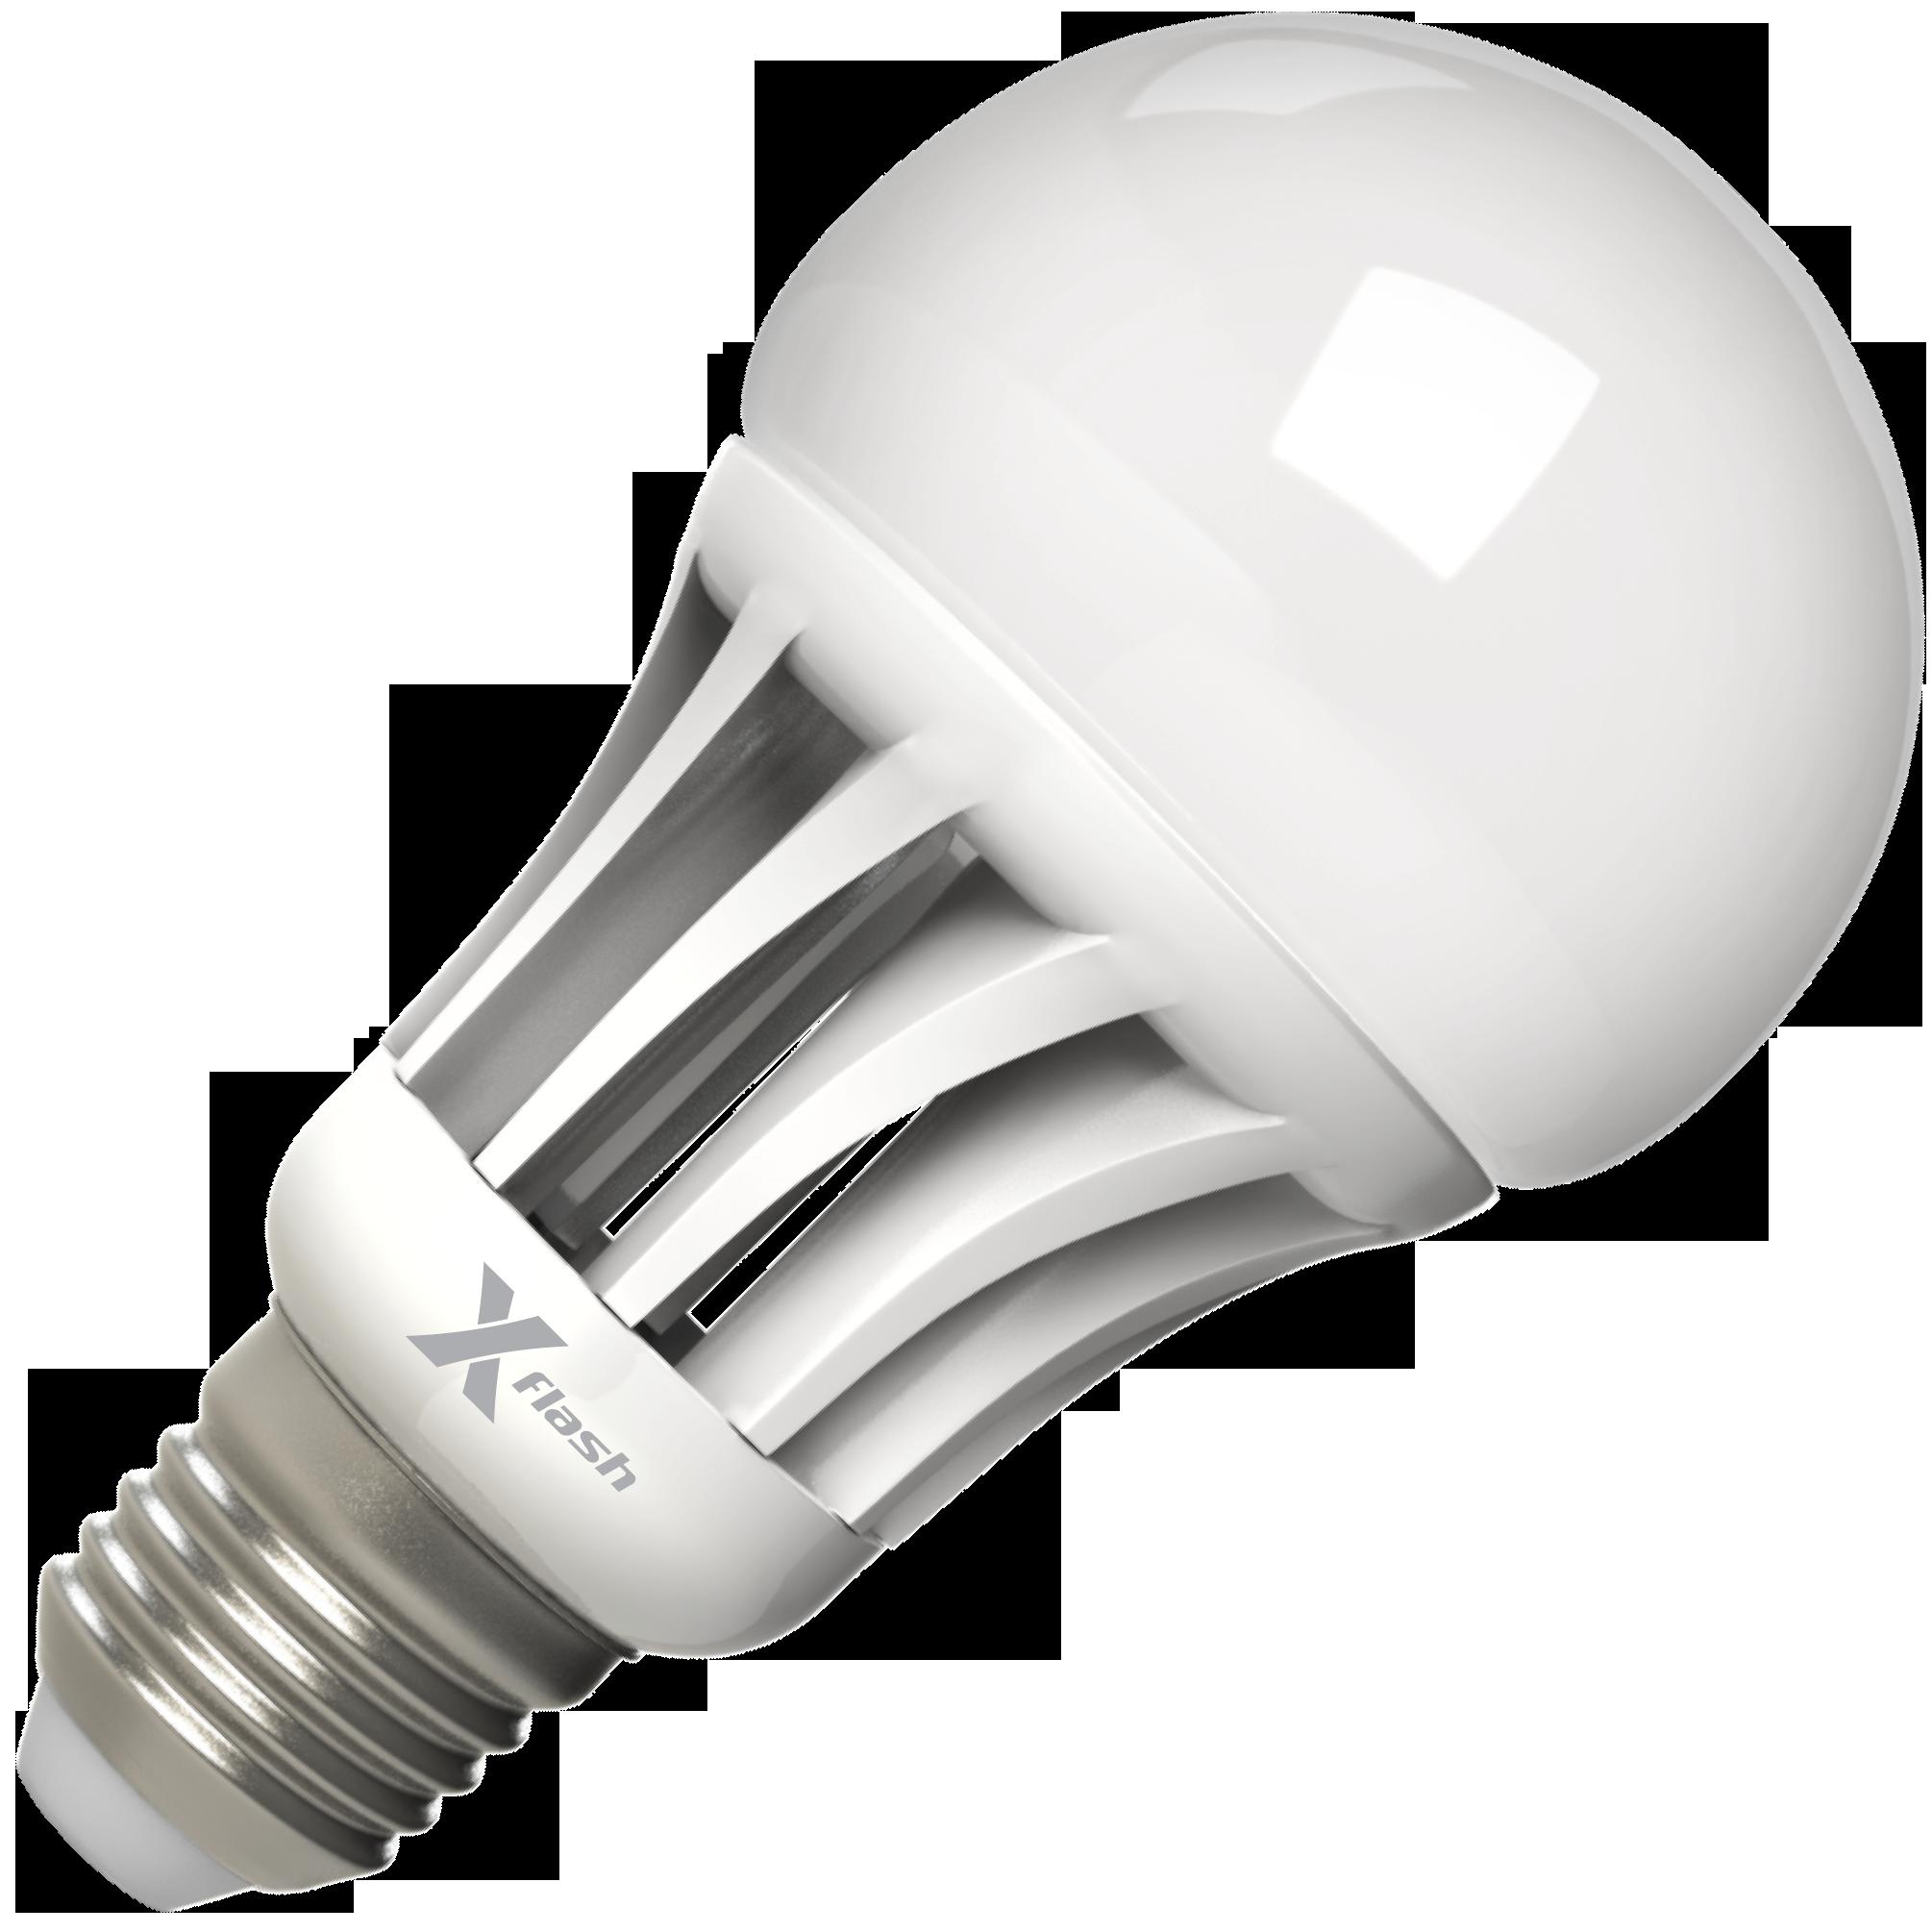 Lamp Png Image Lamp Logo Bedside Lamps Traditional Pendant Lamp Design